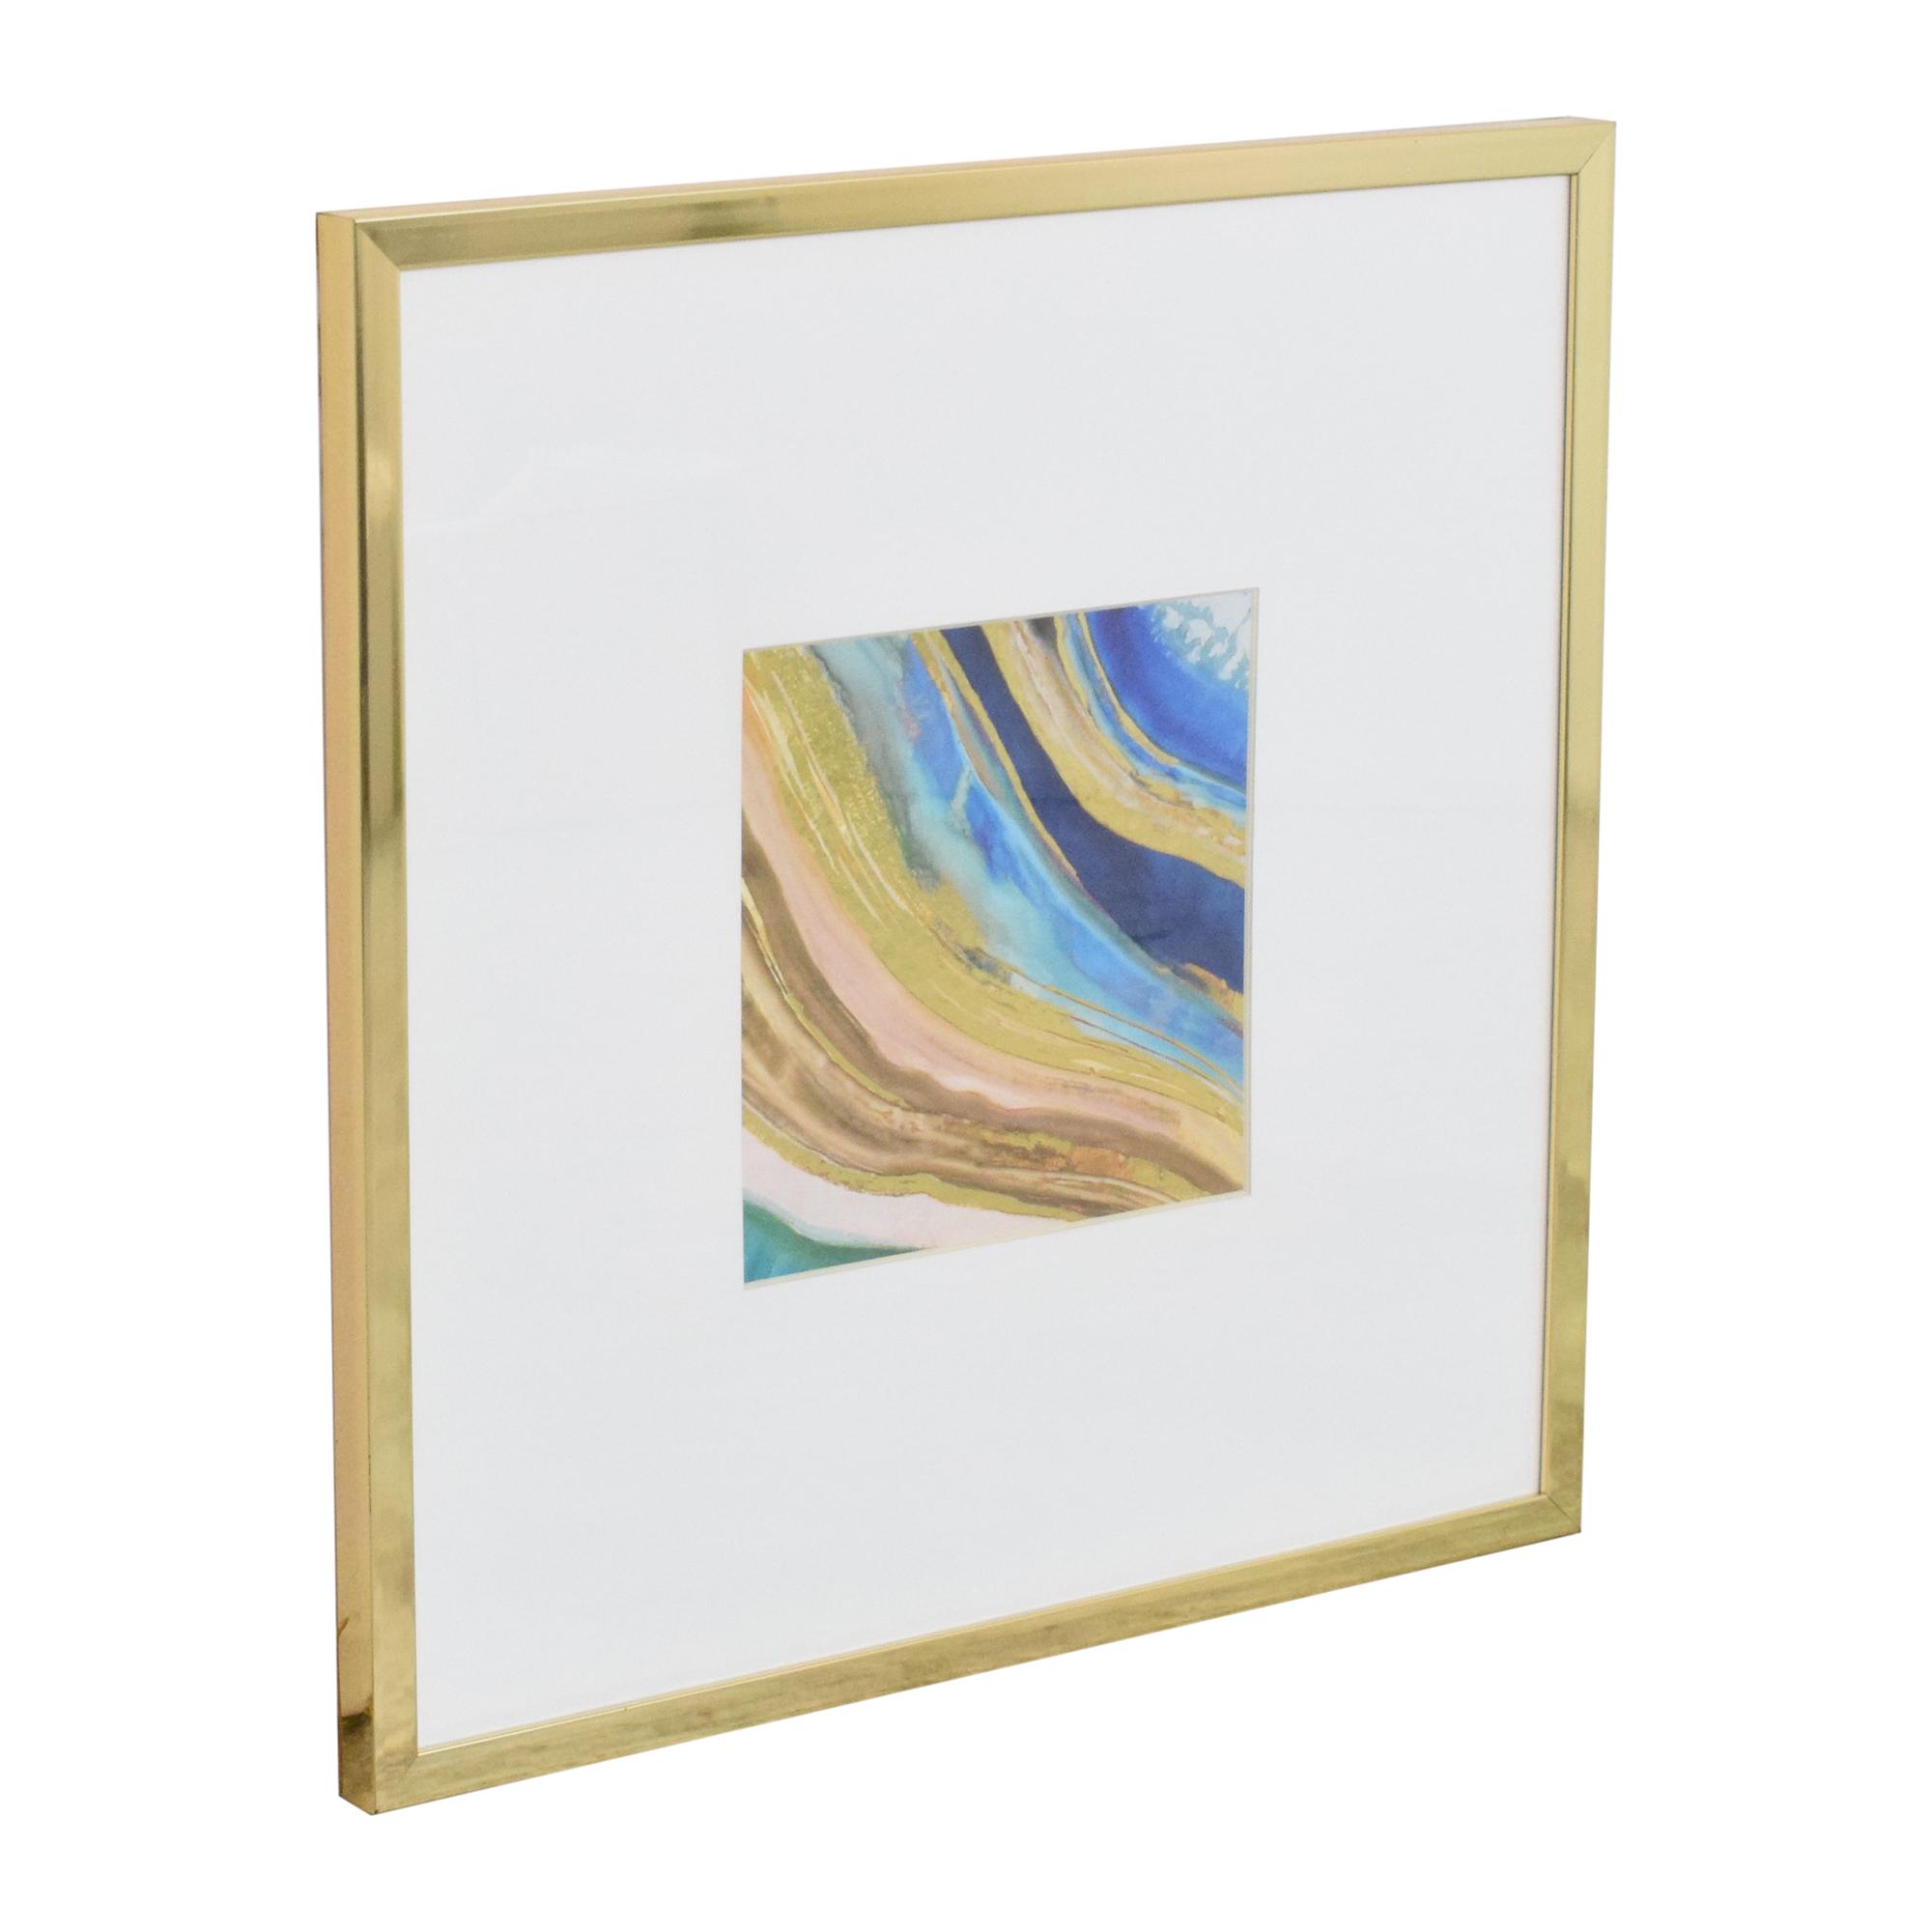 Z Gallerie Z-Gallerie Agate in Peacock 2 Wall Art price